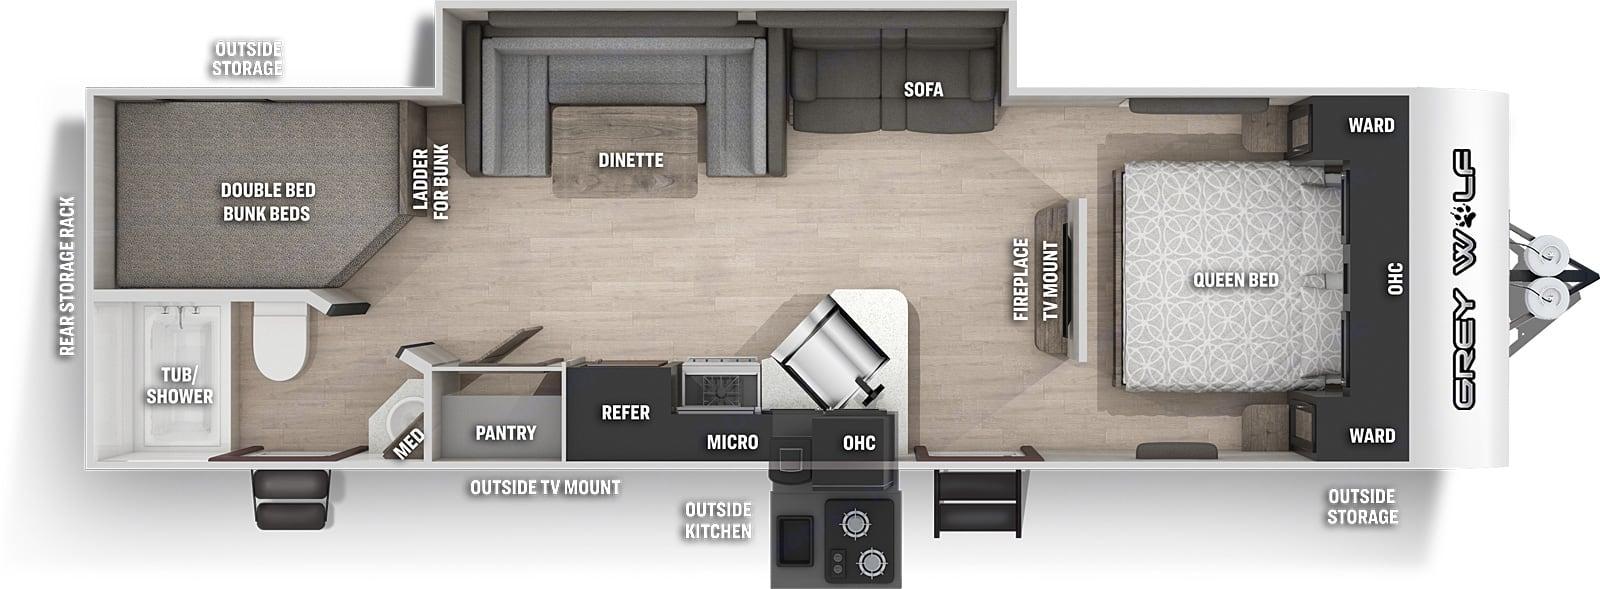 Grey Wolf 26DBH Floorplan. Grey Wolf 26DBH 2021